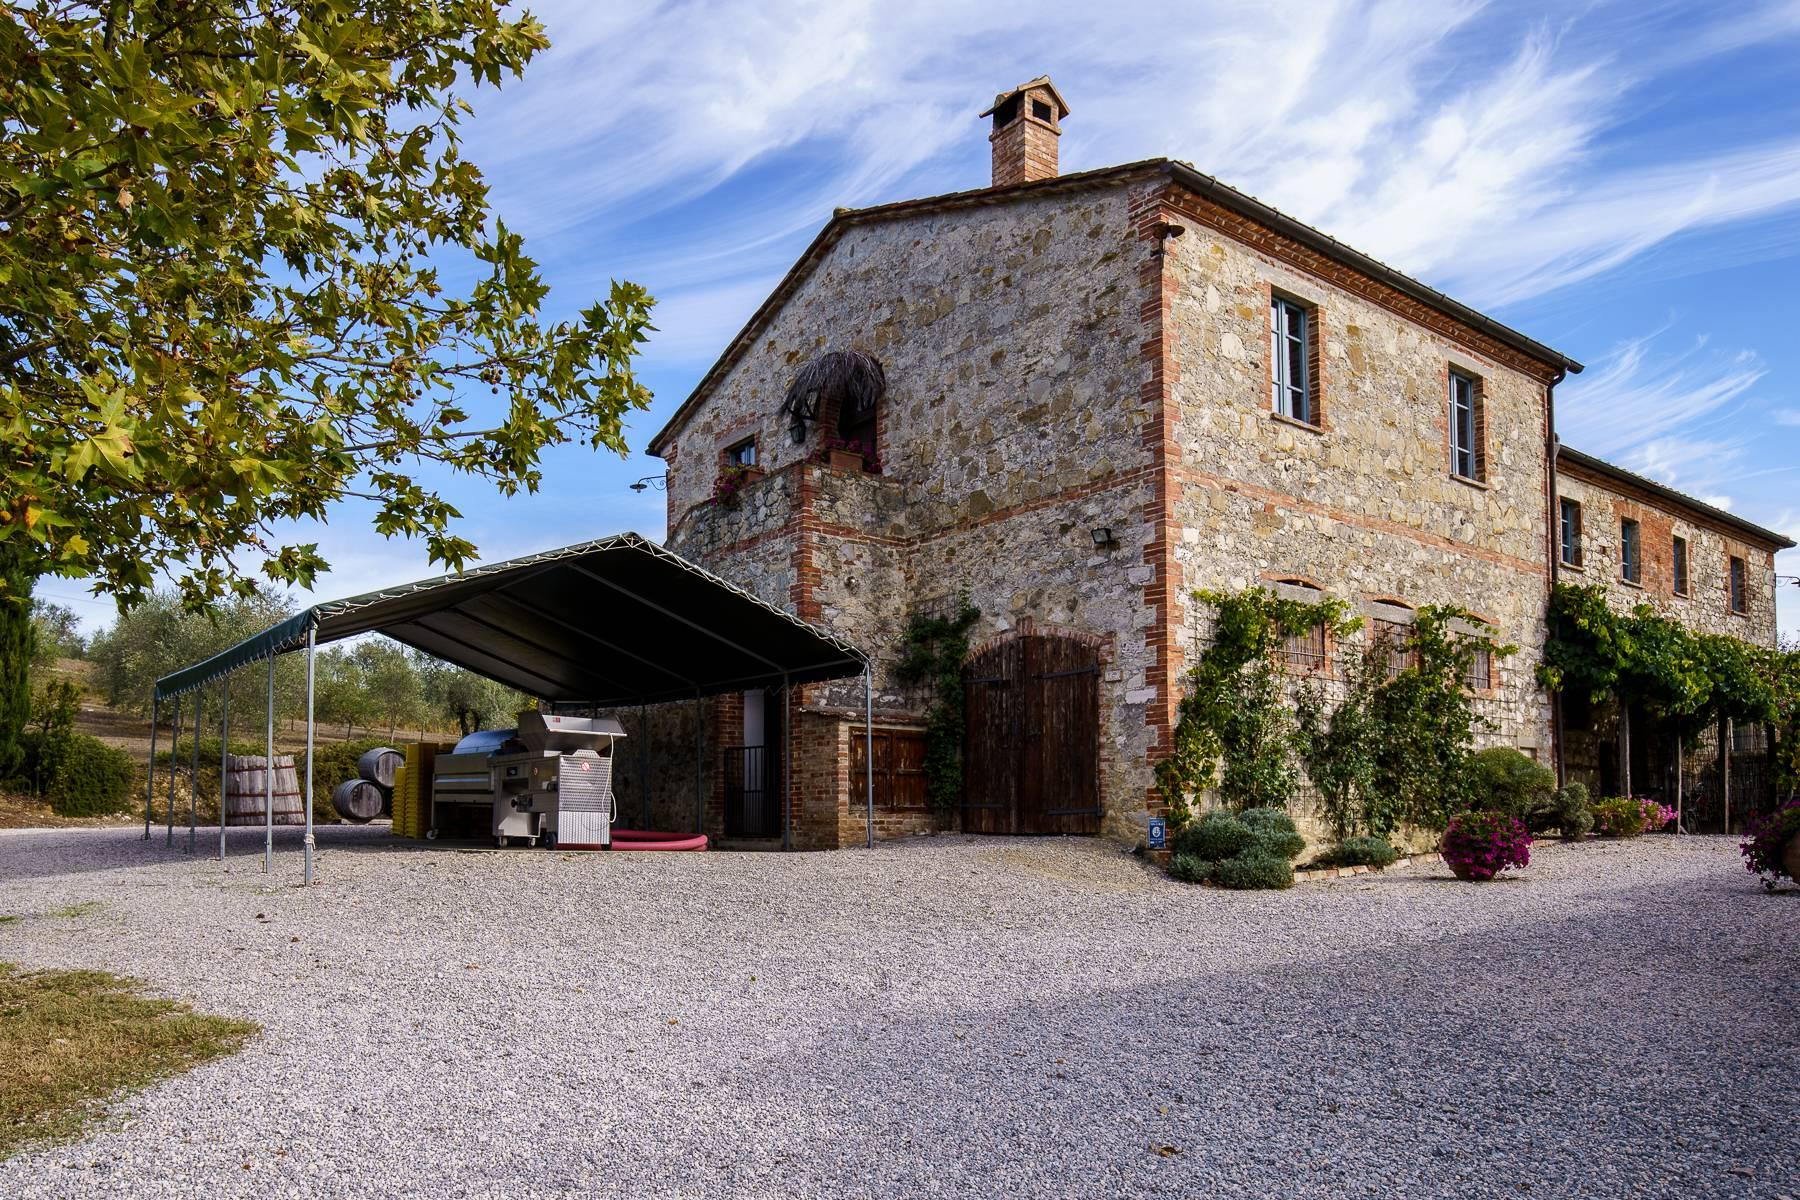 Organic winery in the heart of Crete Senesi - 3